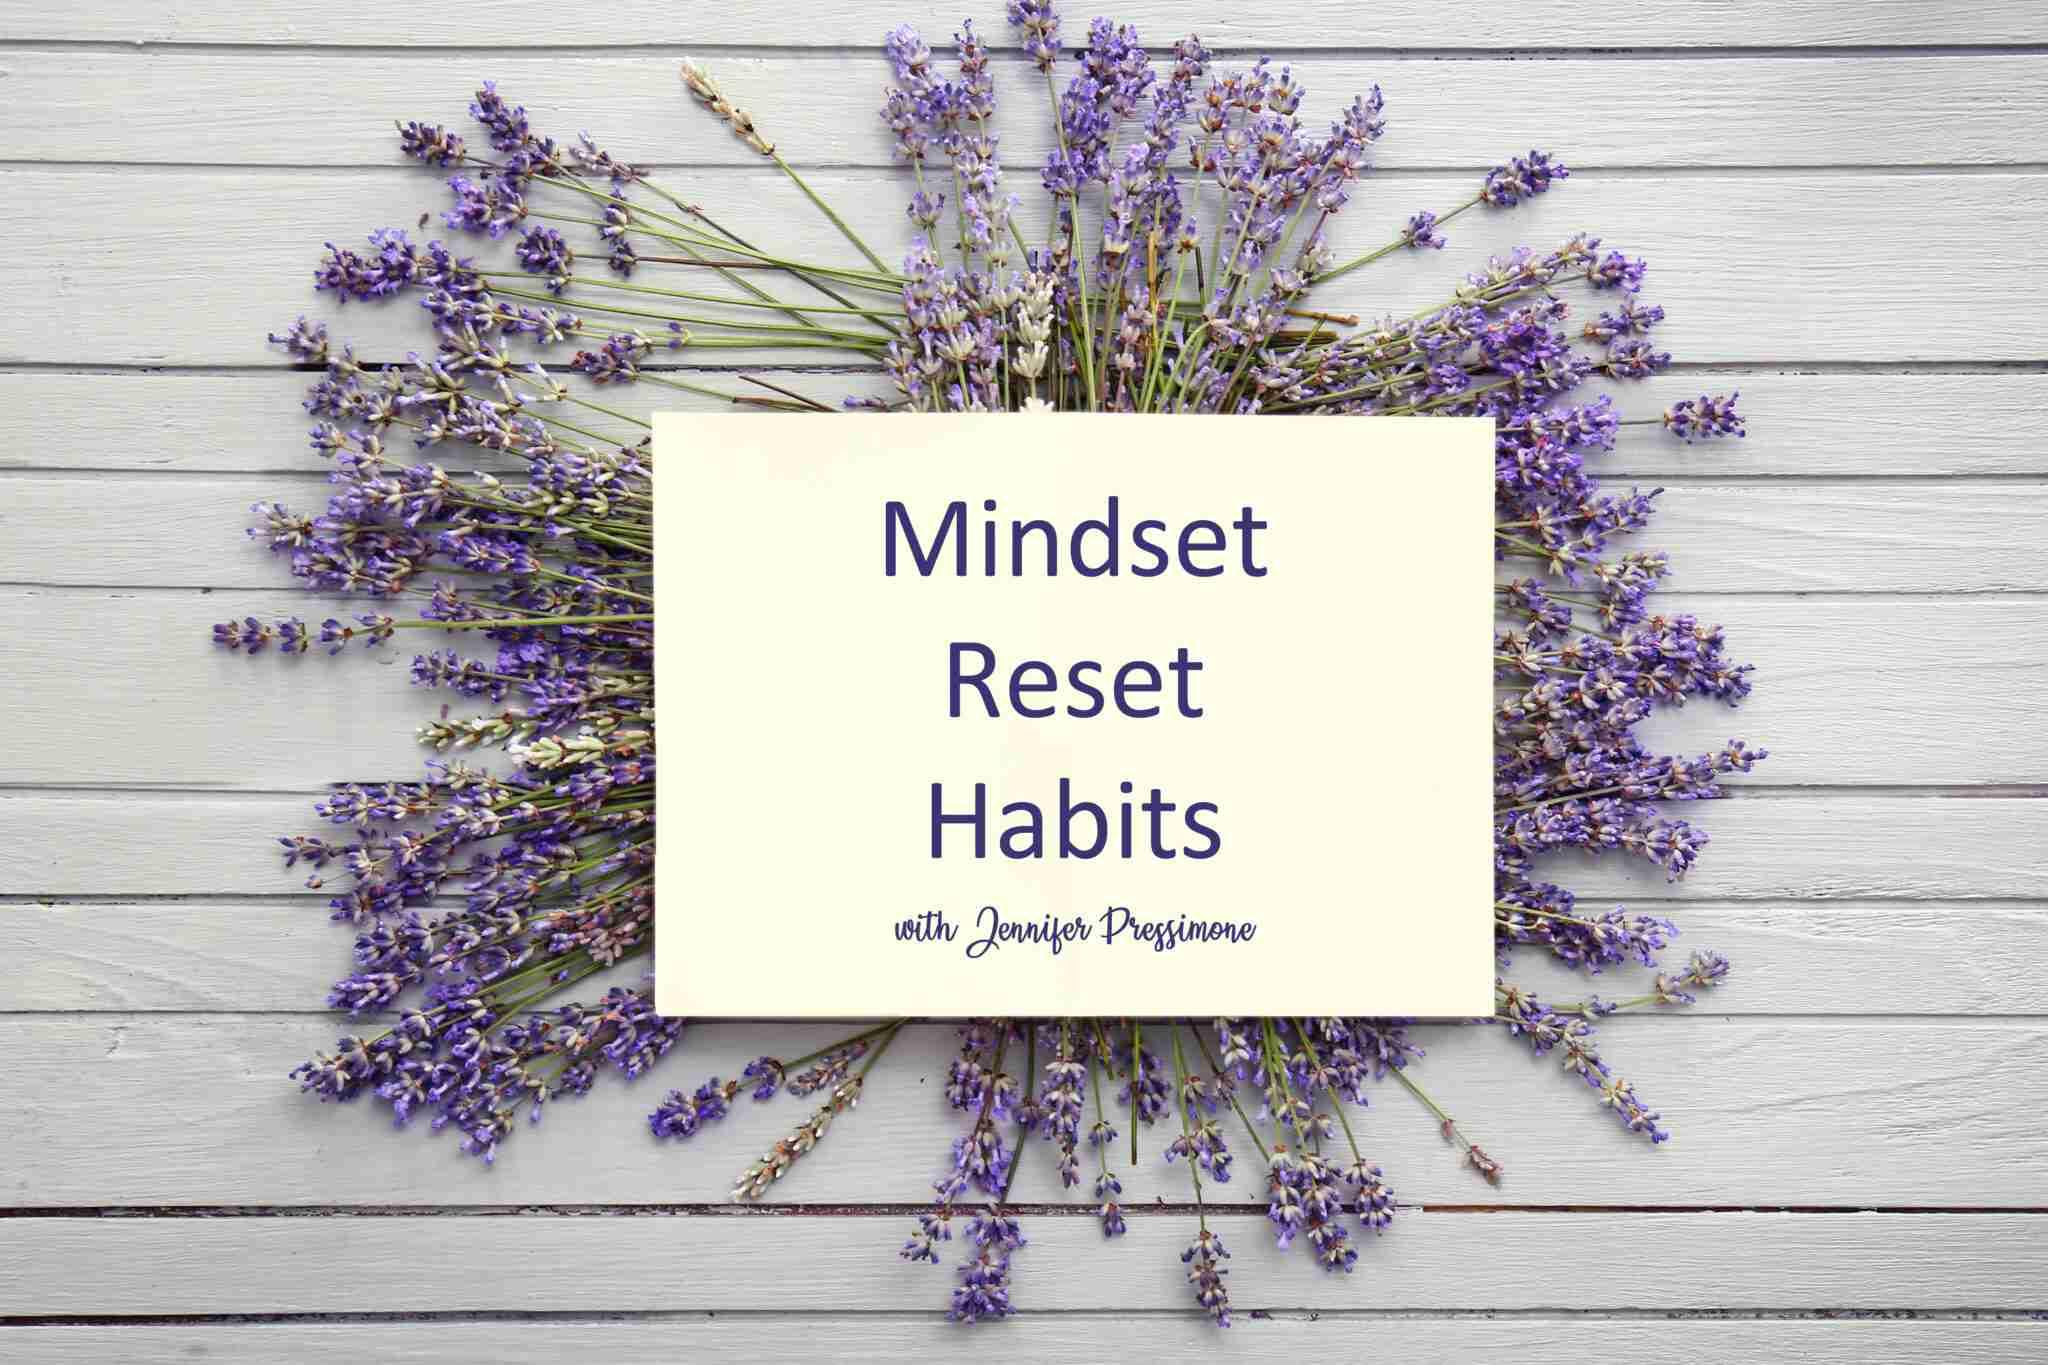 Mindset Reset Habits